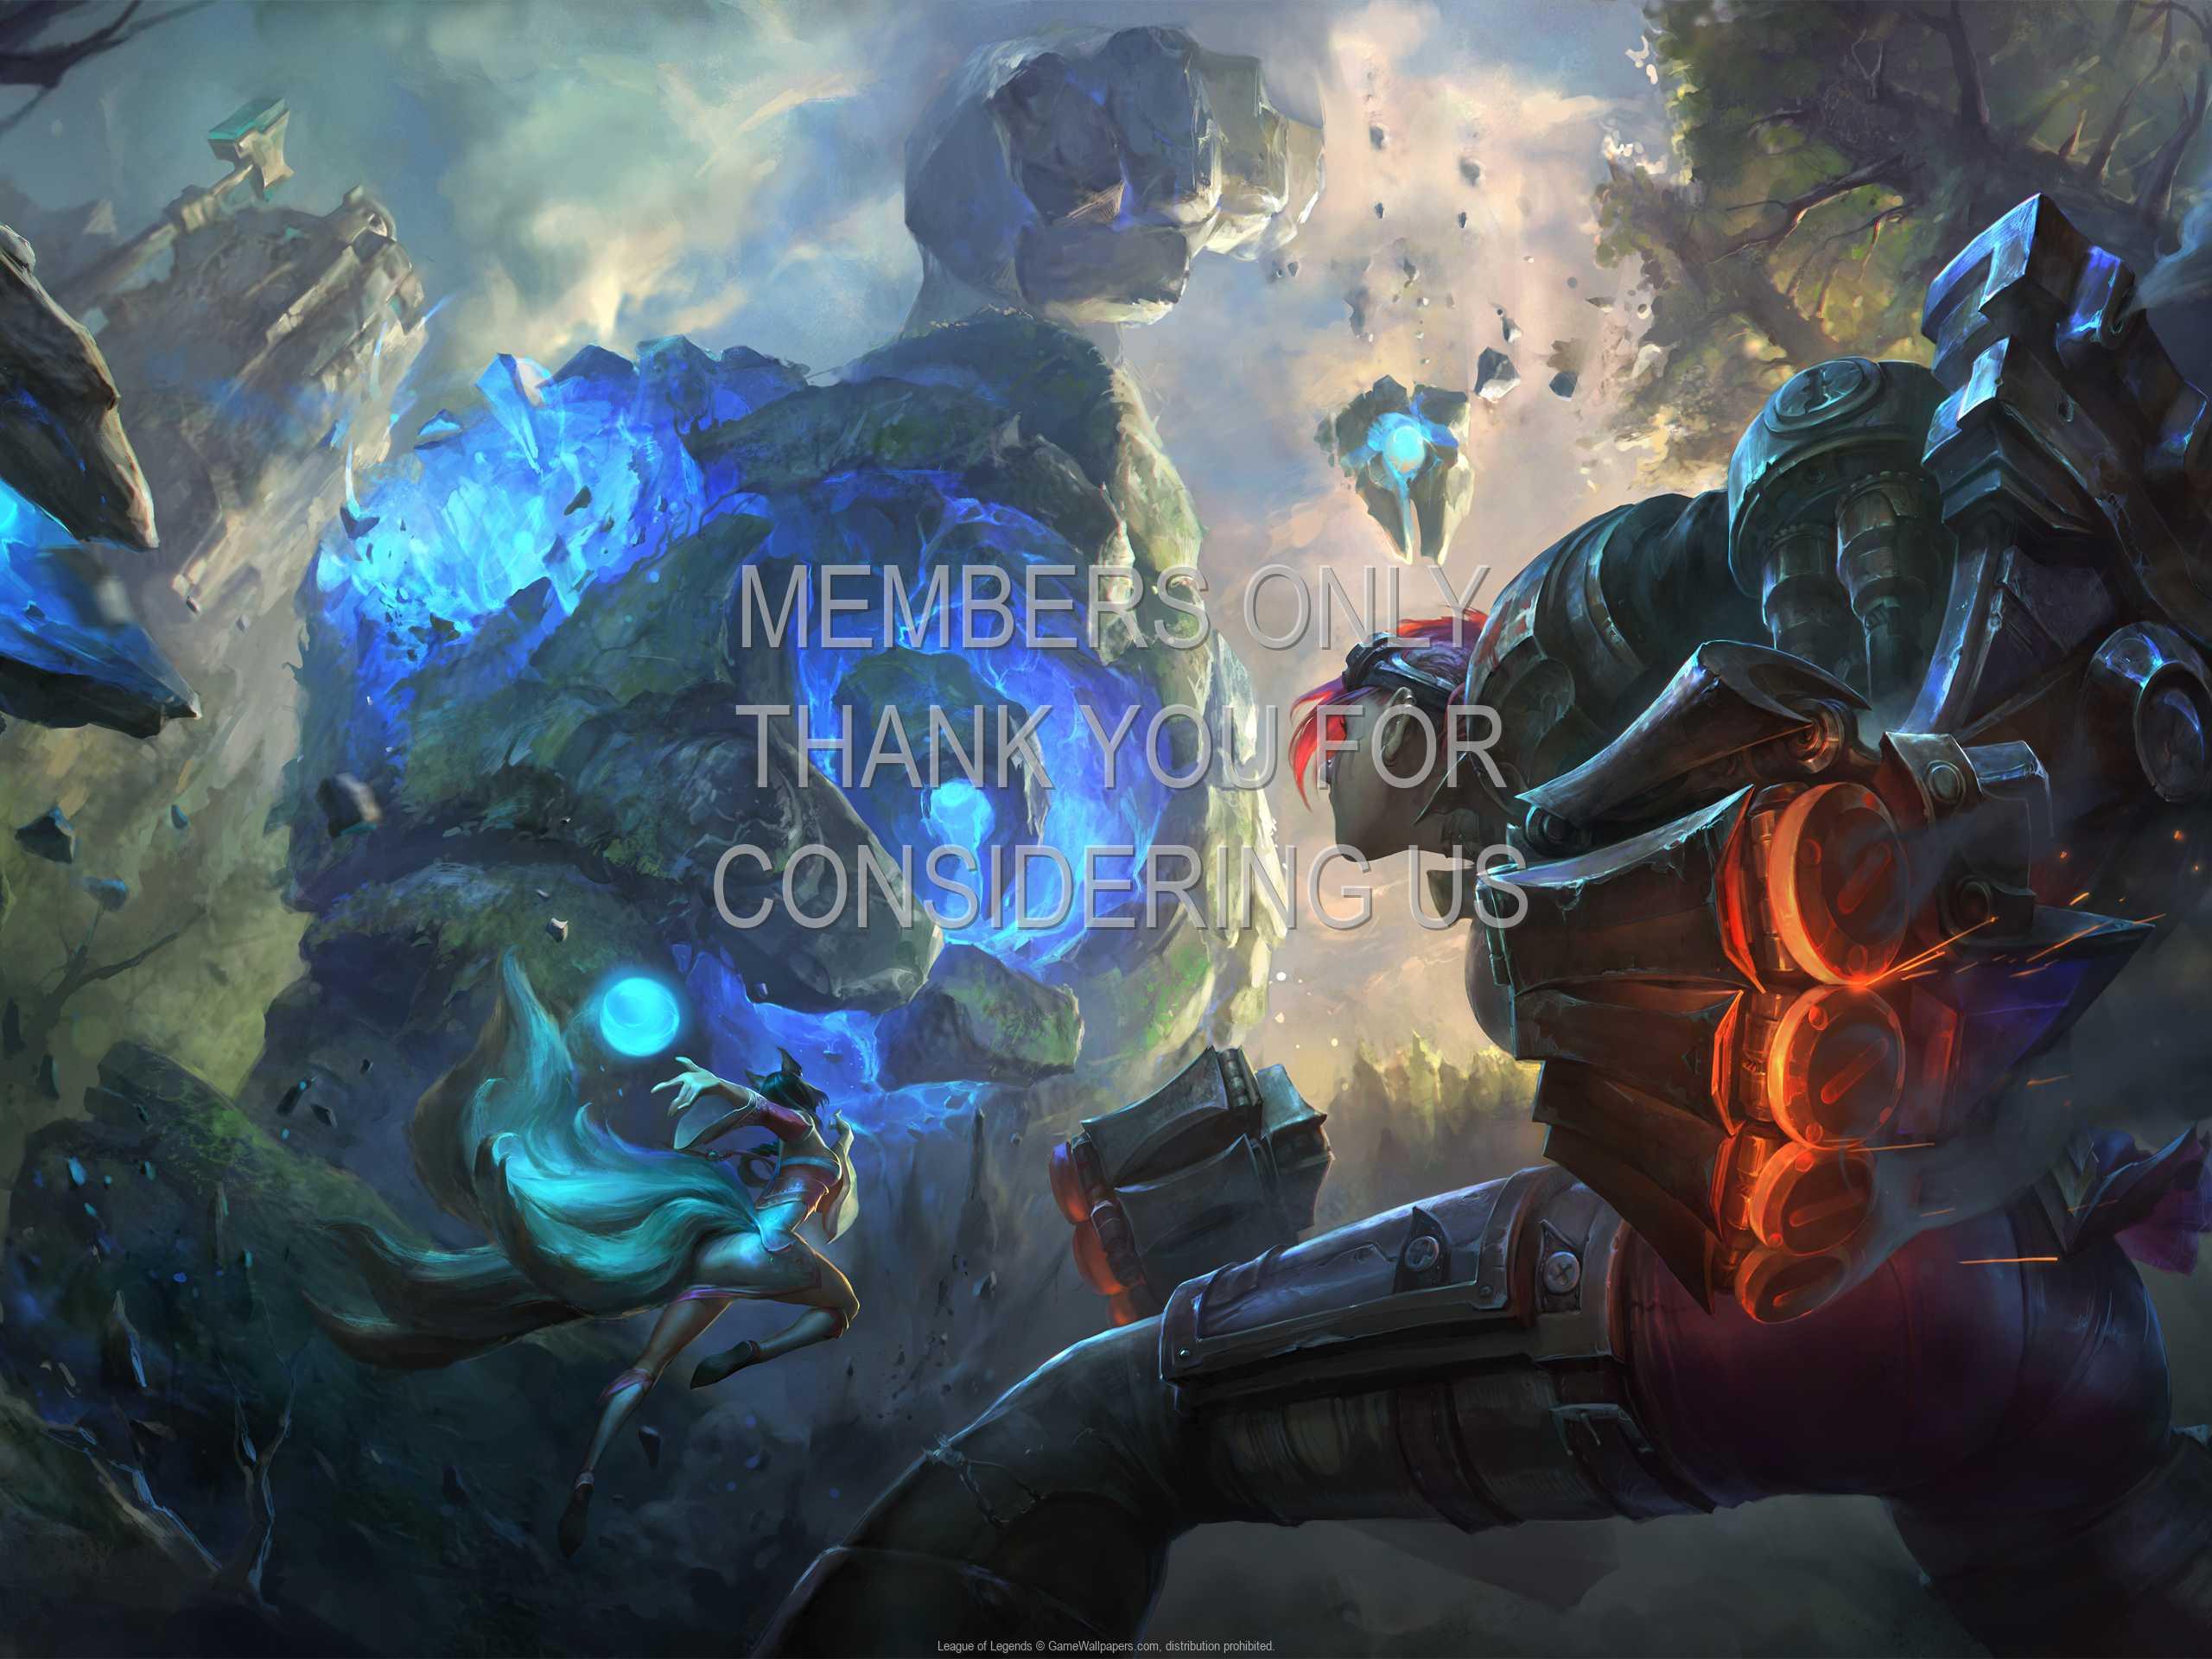 League of Legends 1080p Horizontal Handy Hintergrundbild 21